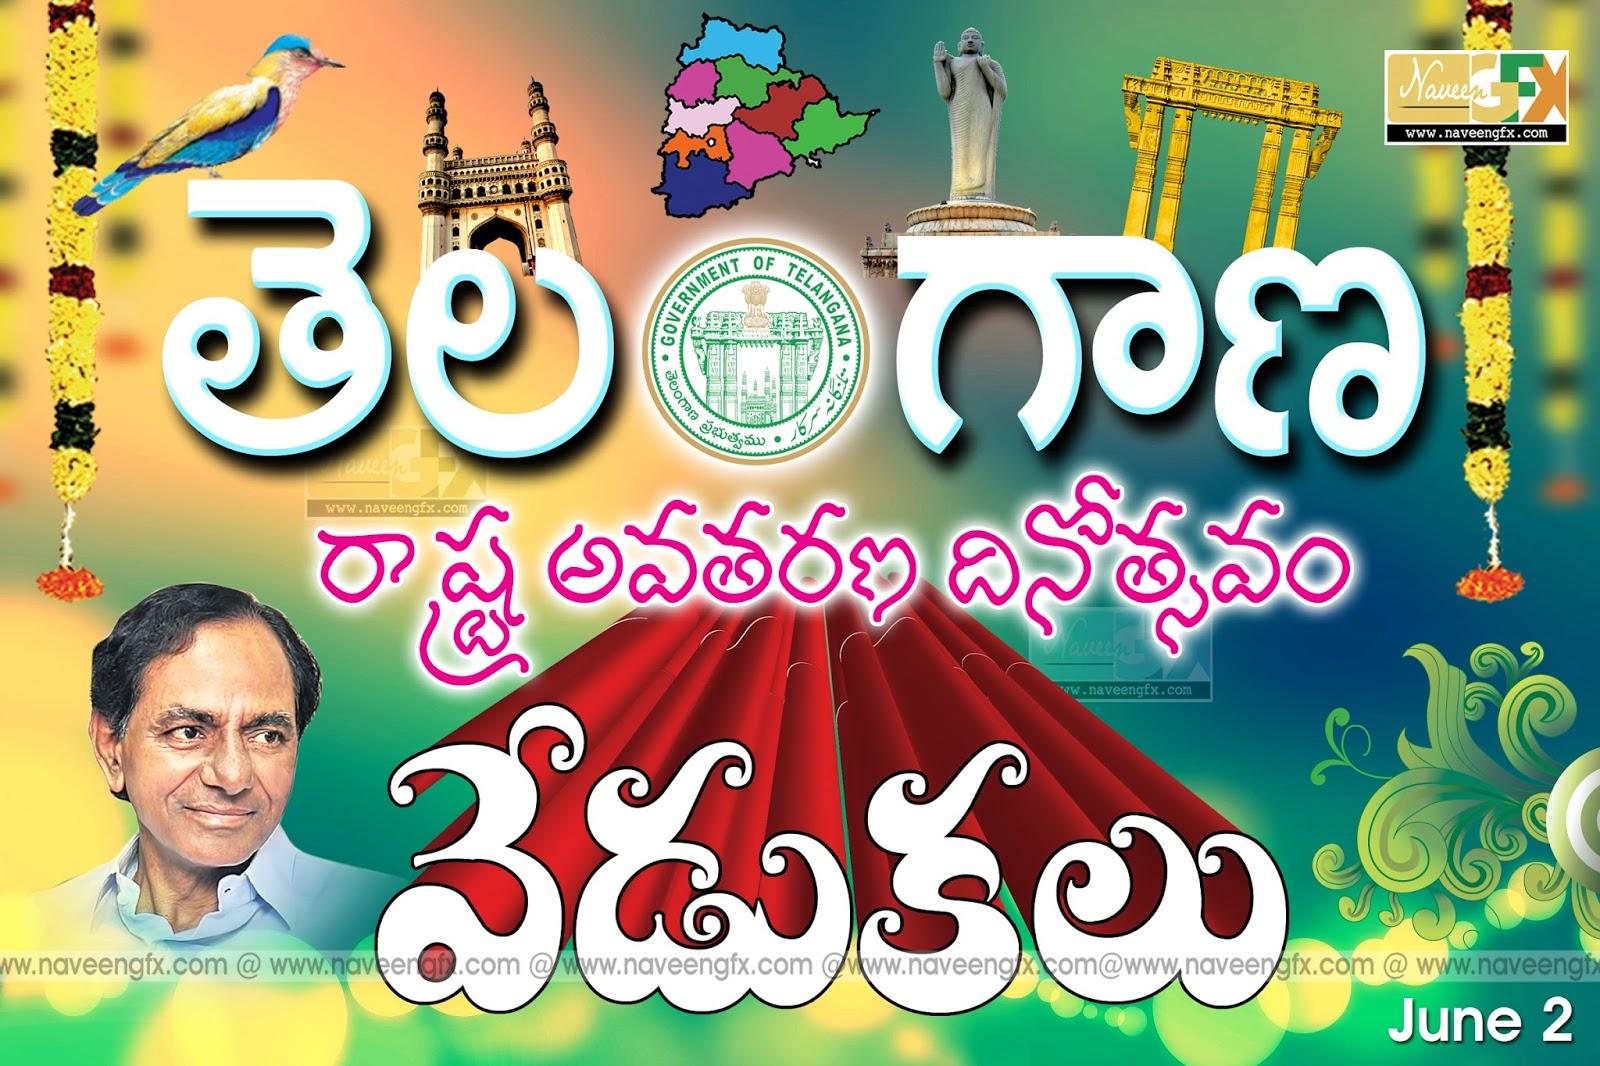 telangana formation day telugu greetings wishes and